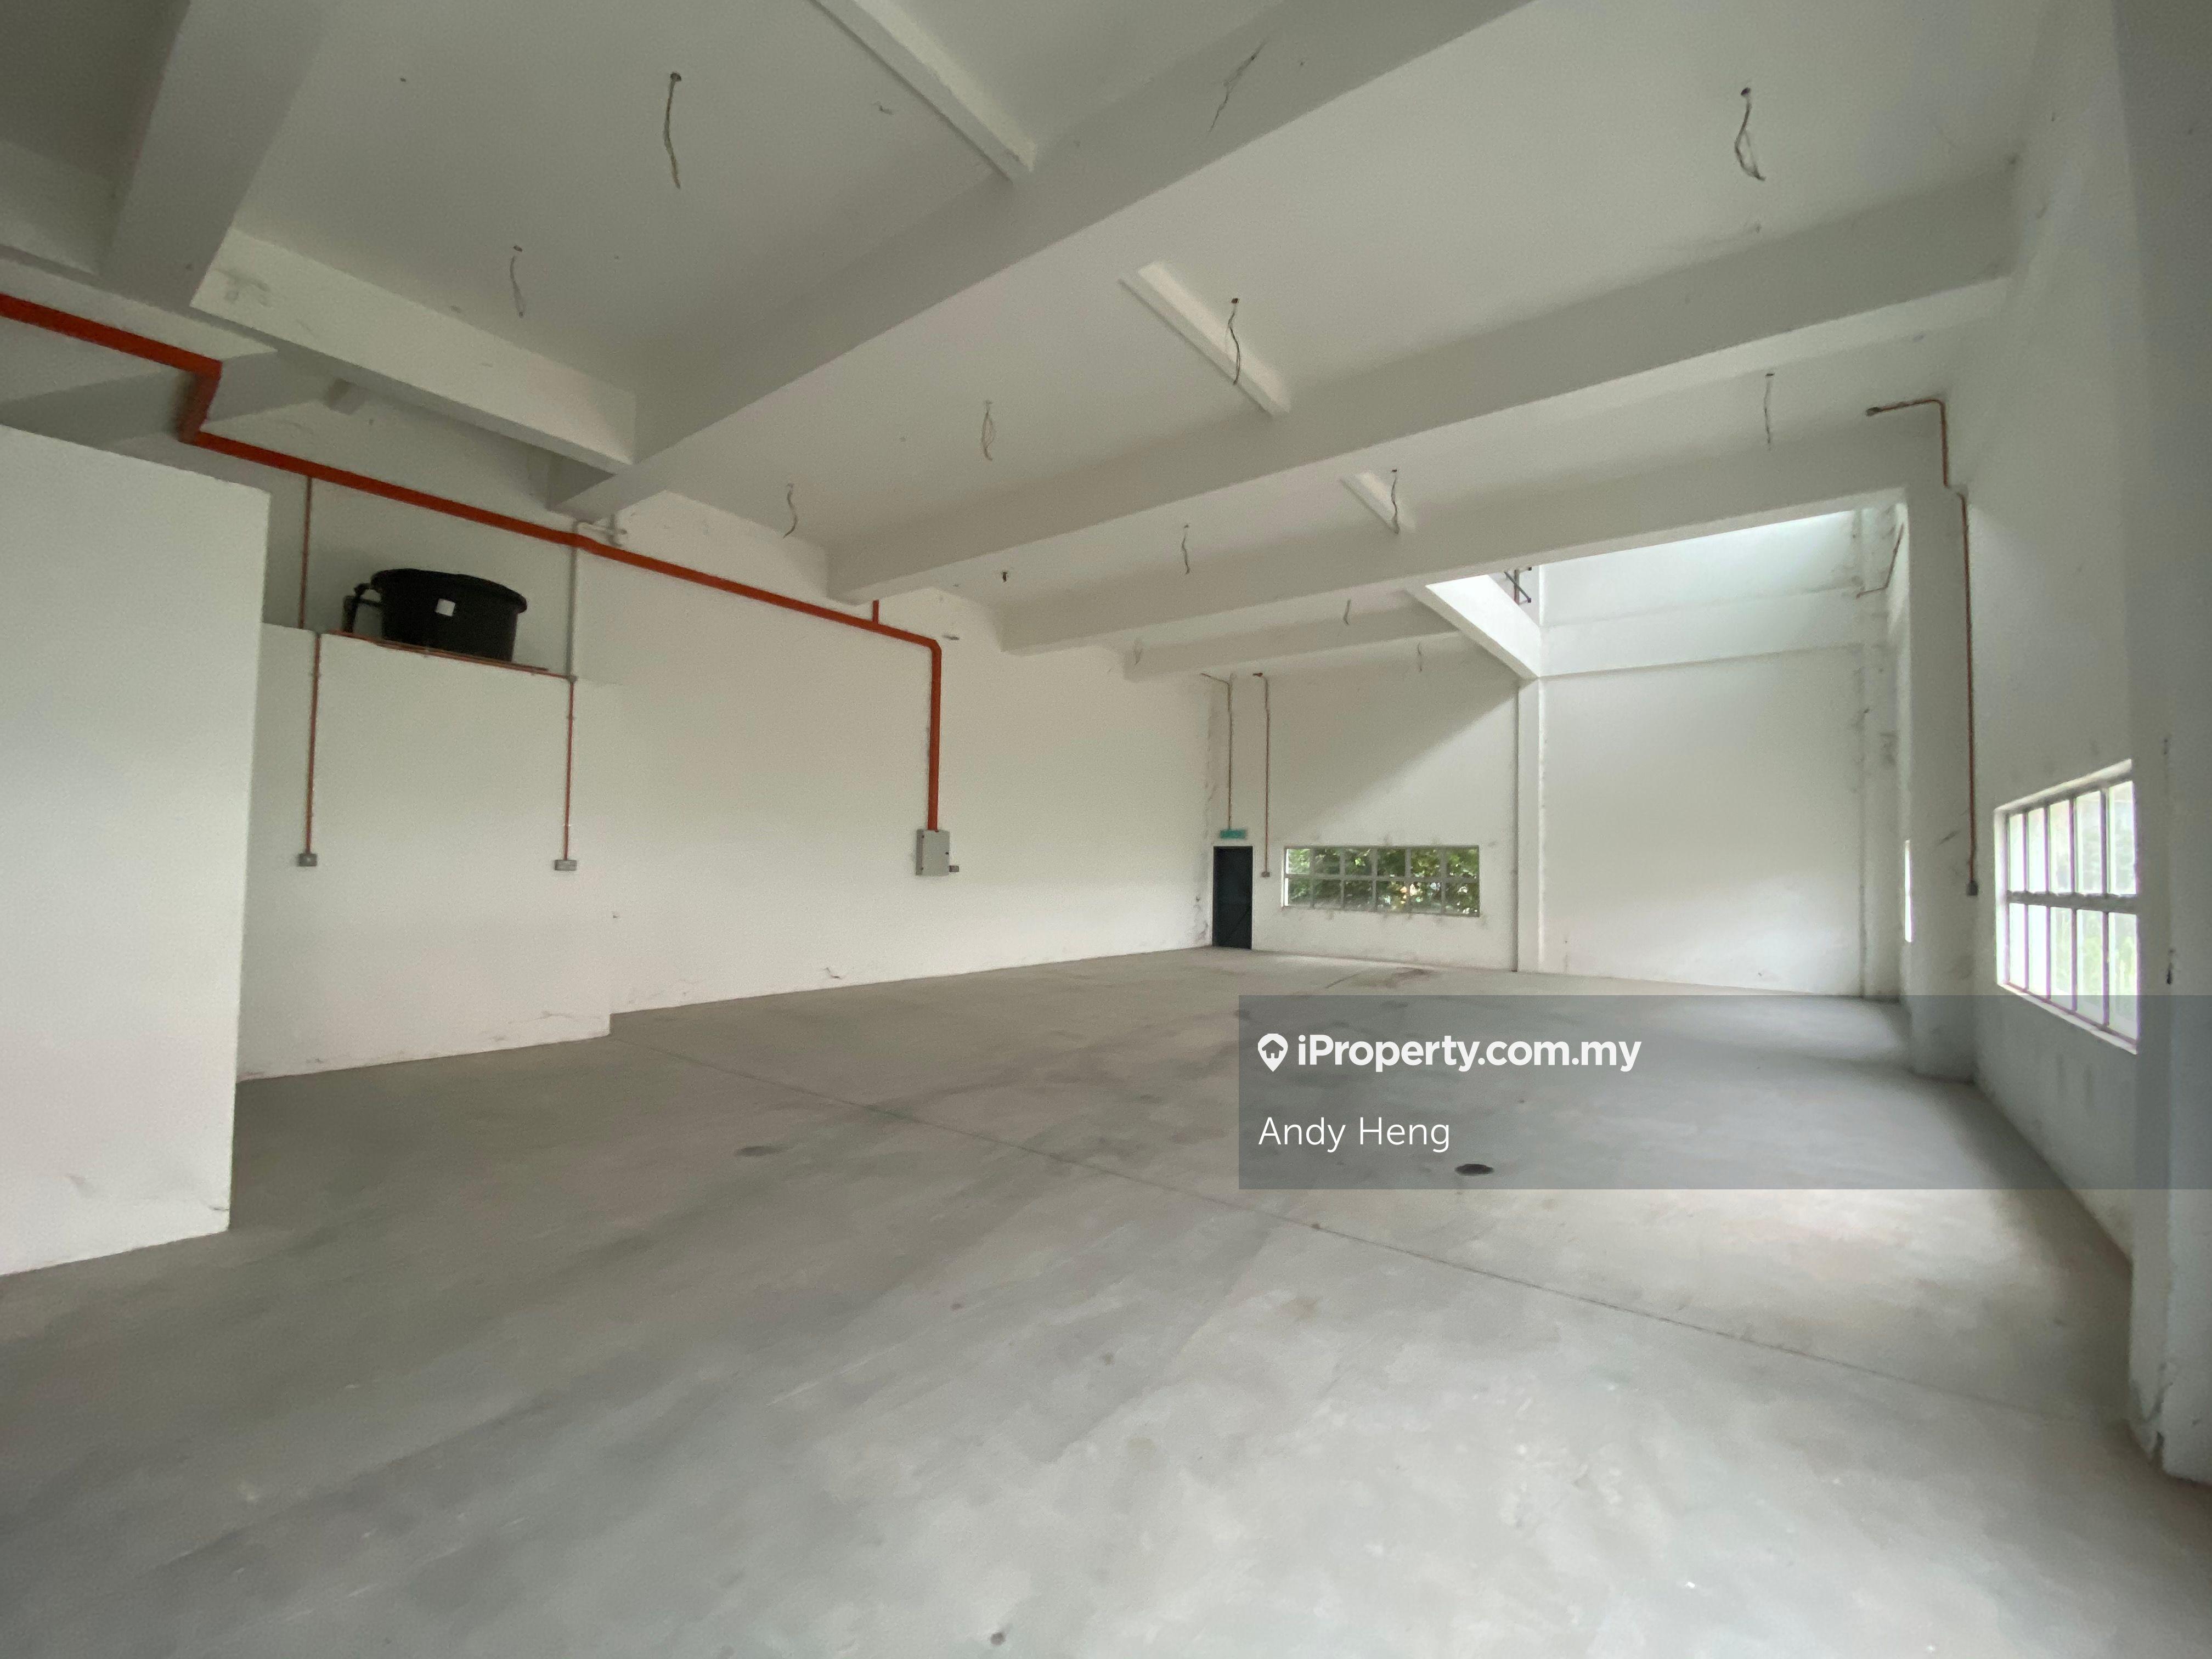 Semi-Detached Factory Nusajaya SiLC JB, Iskandar Puteri (Nusajaya)